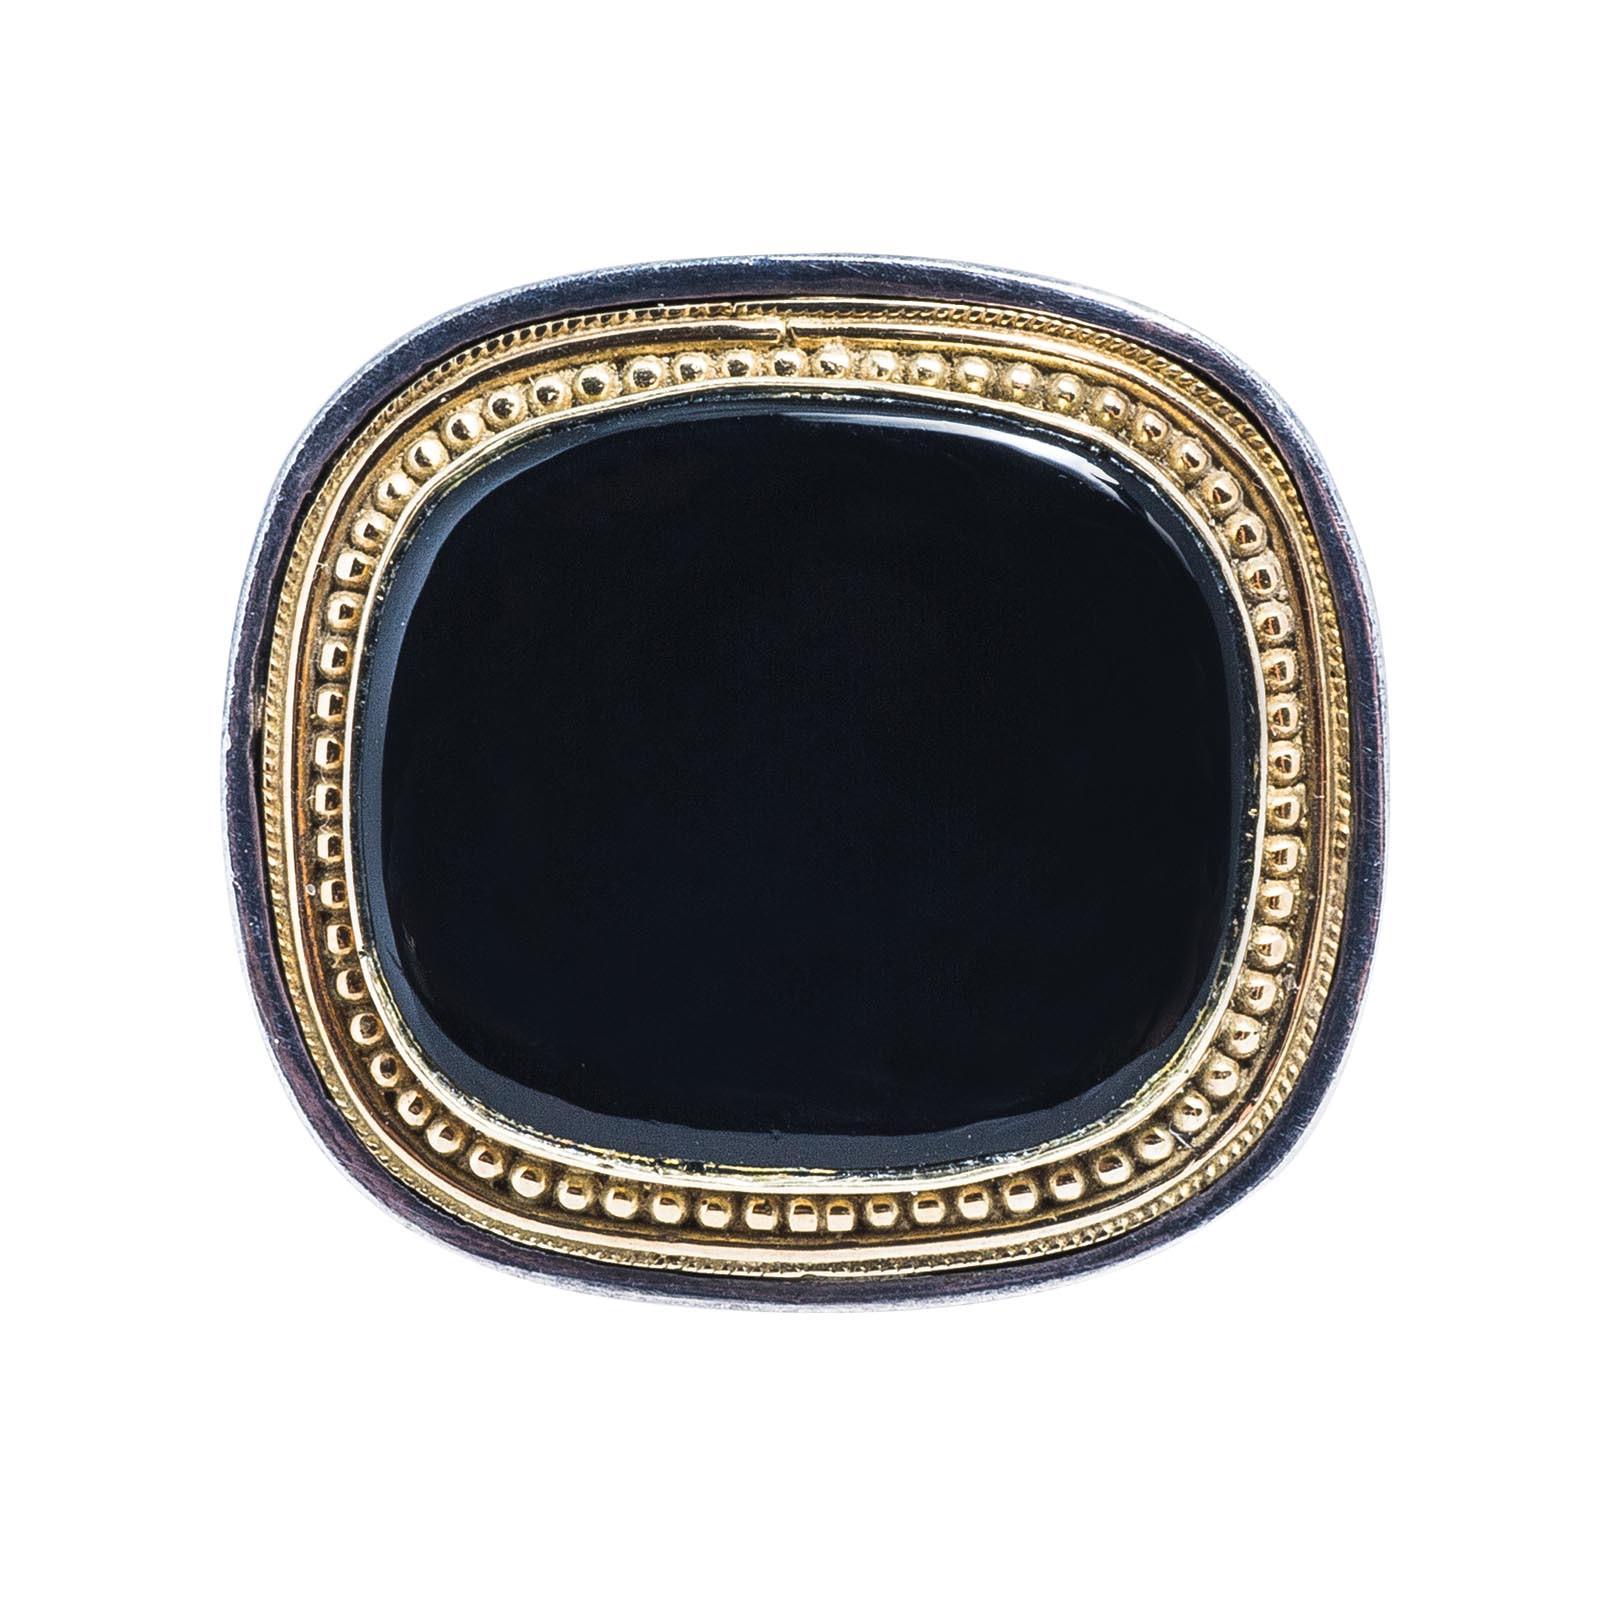 Vintage Konstantino Black Onyx Ring